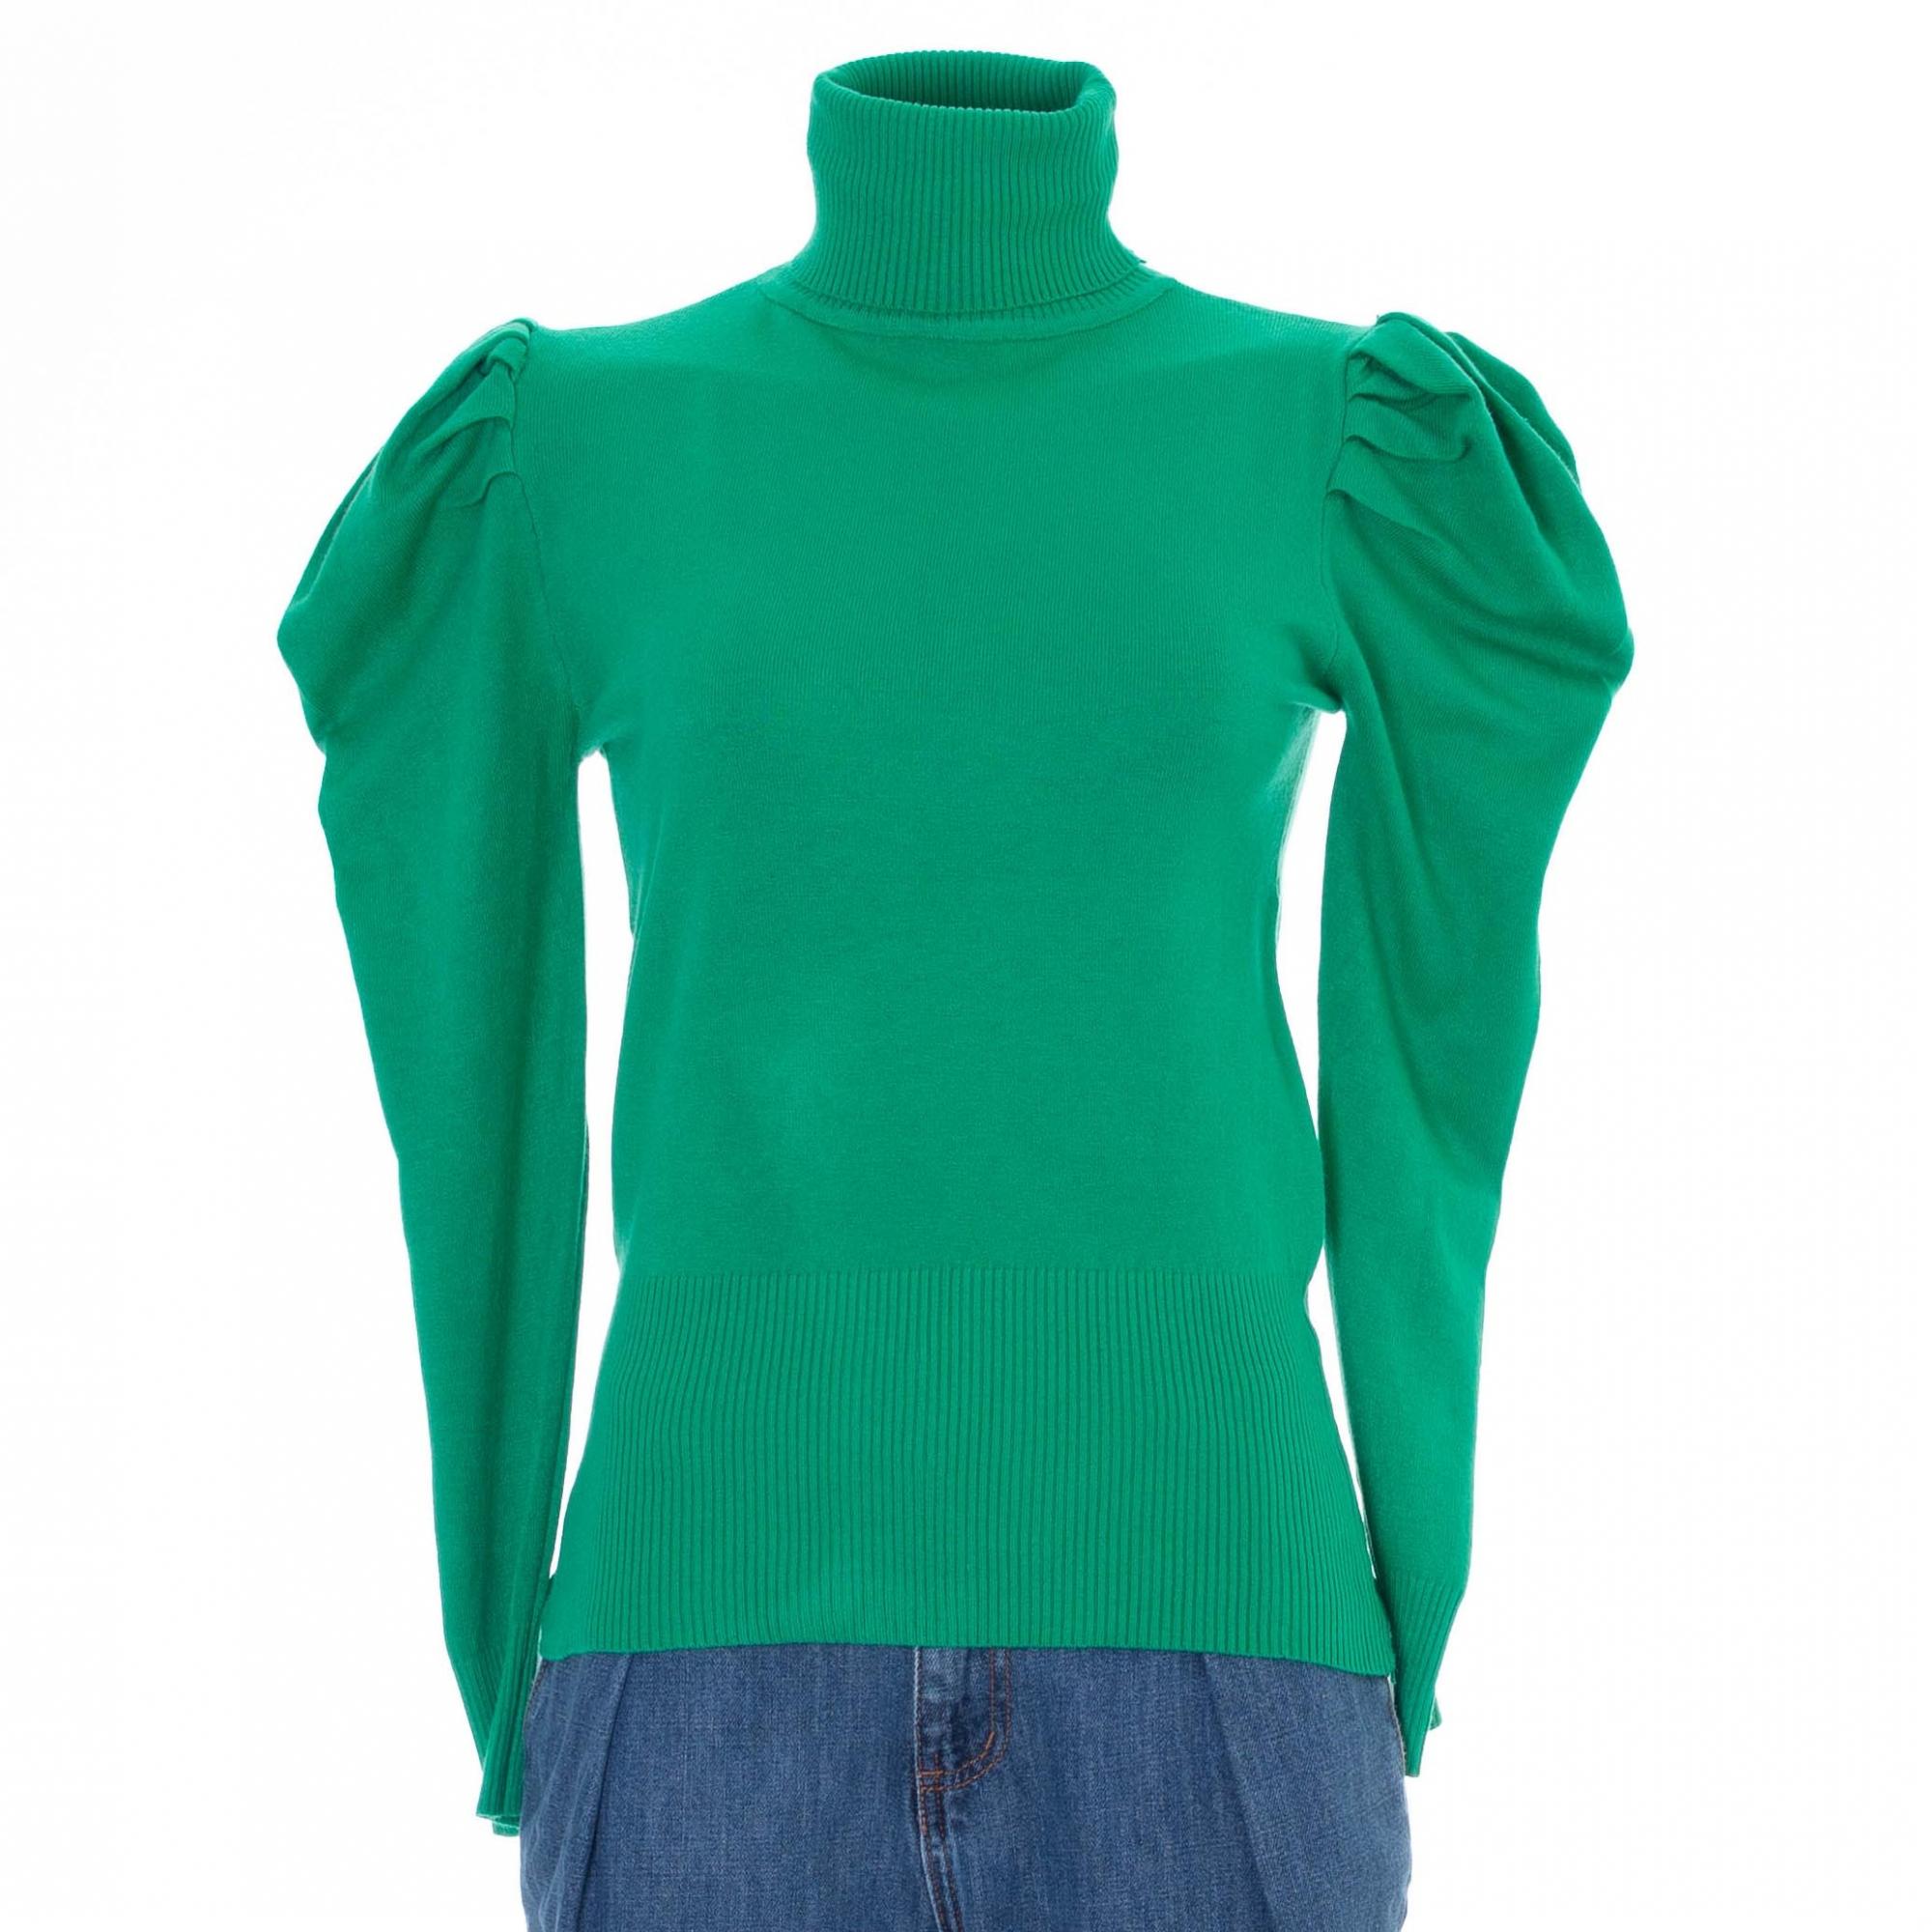 Blusa Gola Rolê Glamour em Tricot